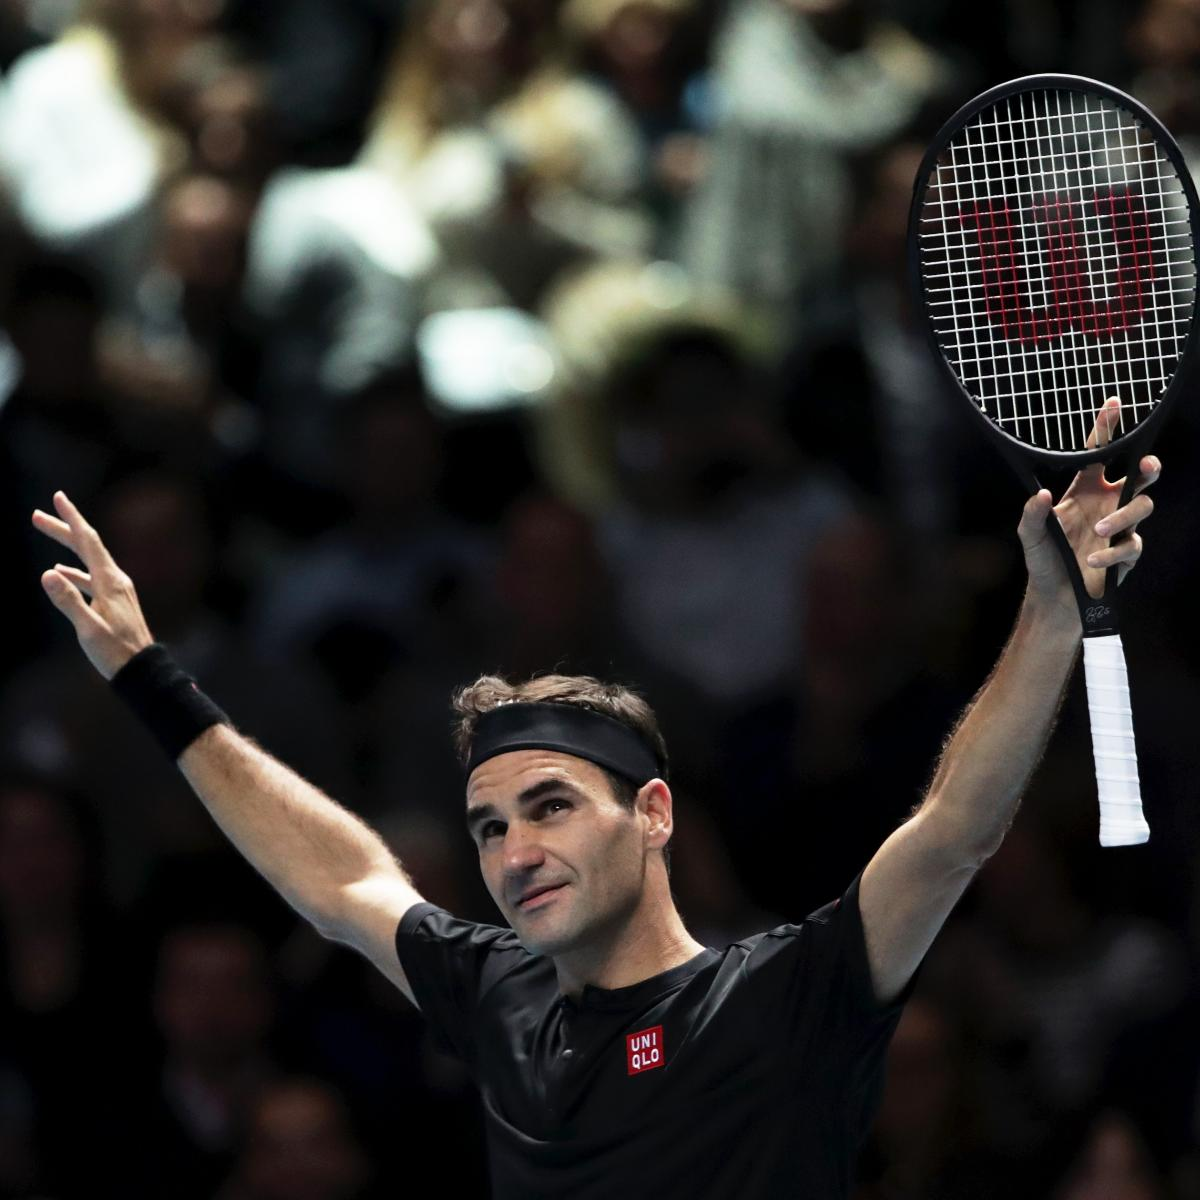 ATP World Tour Finals 2019 Results: Roger Federer Eliminates Novak Djokovic - Bleacher Report